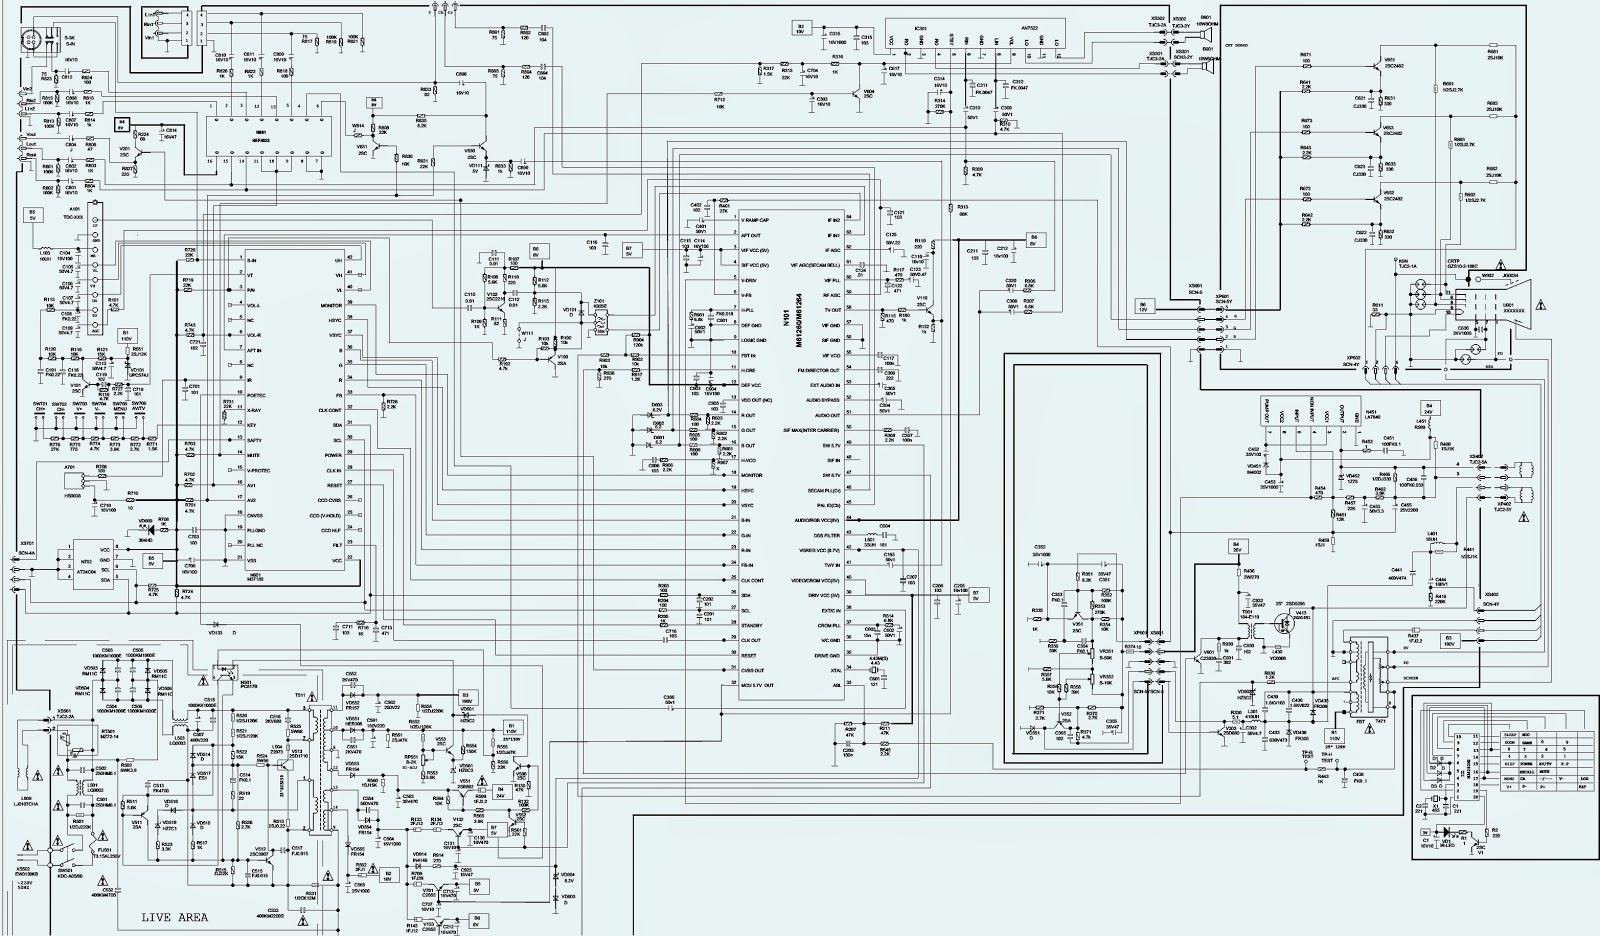 samsung tv schematic layout best site wiring harness samsung tv wiring diagram tv and component wiring [ 1600 x 936 Pixel ]